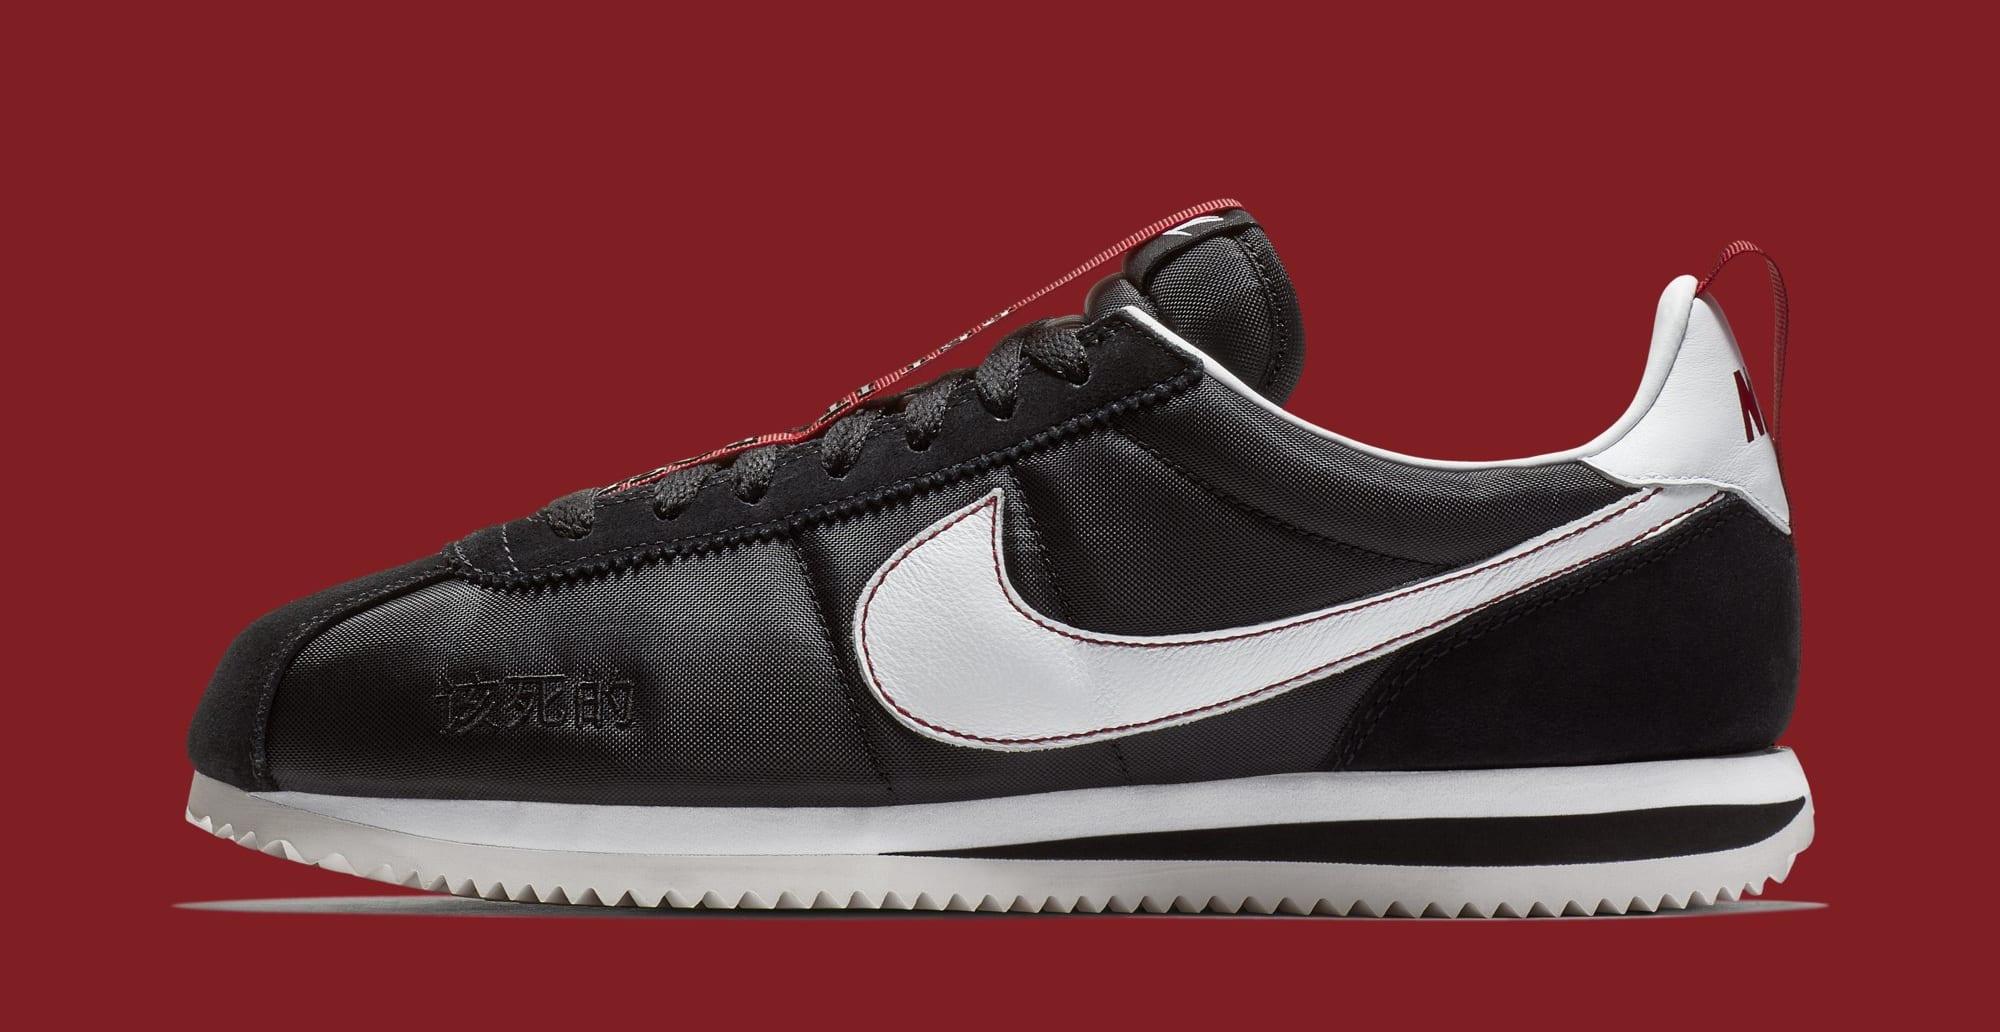 Kendrick Lamar x Nike Cortez Kenny 3 BV0833-016 (Lateral)